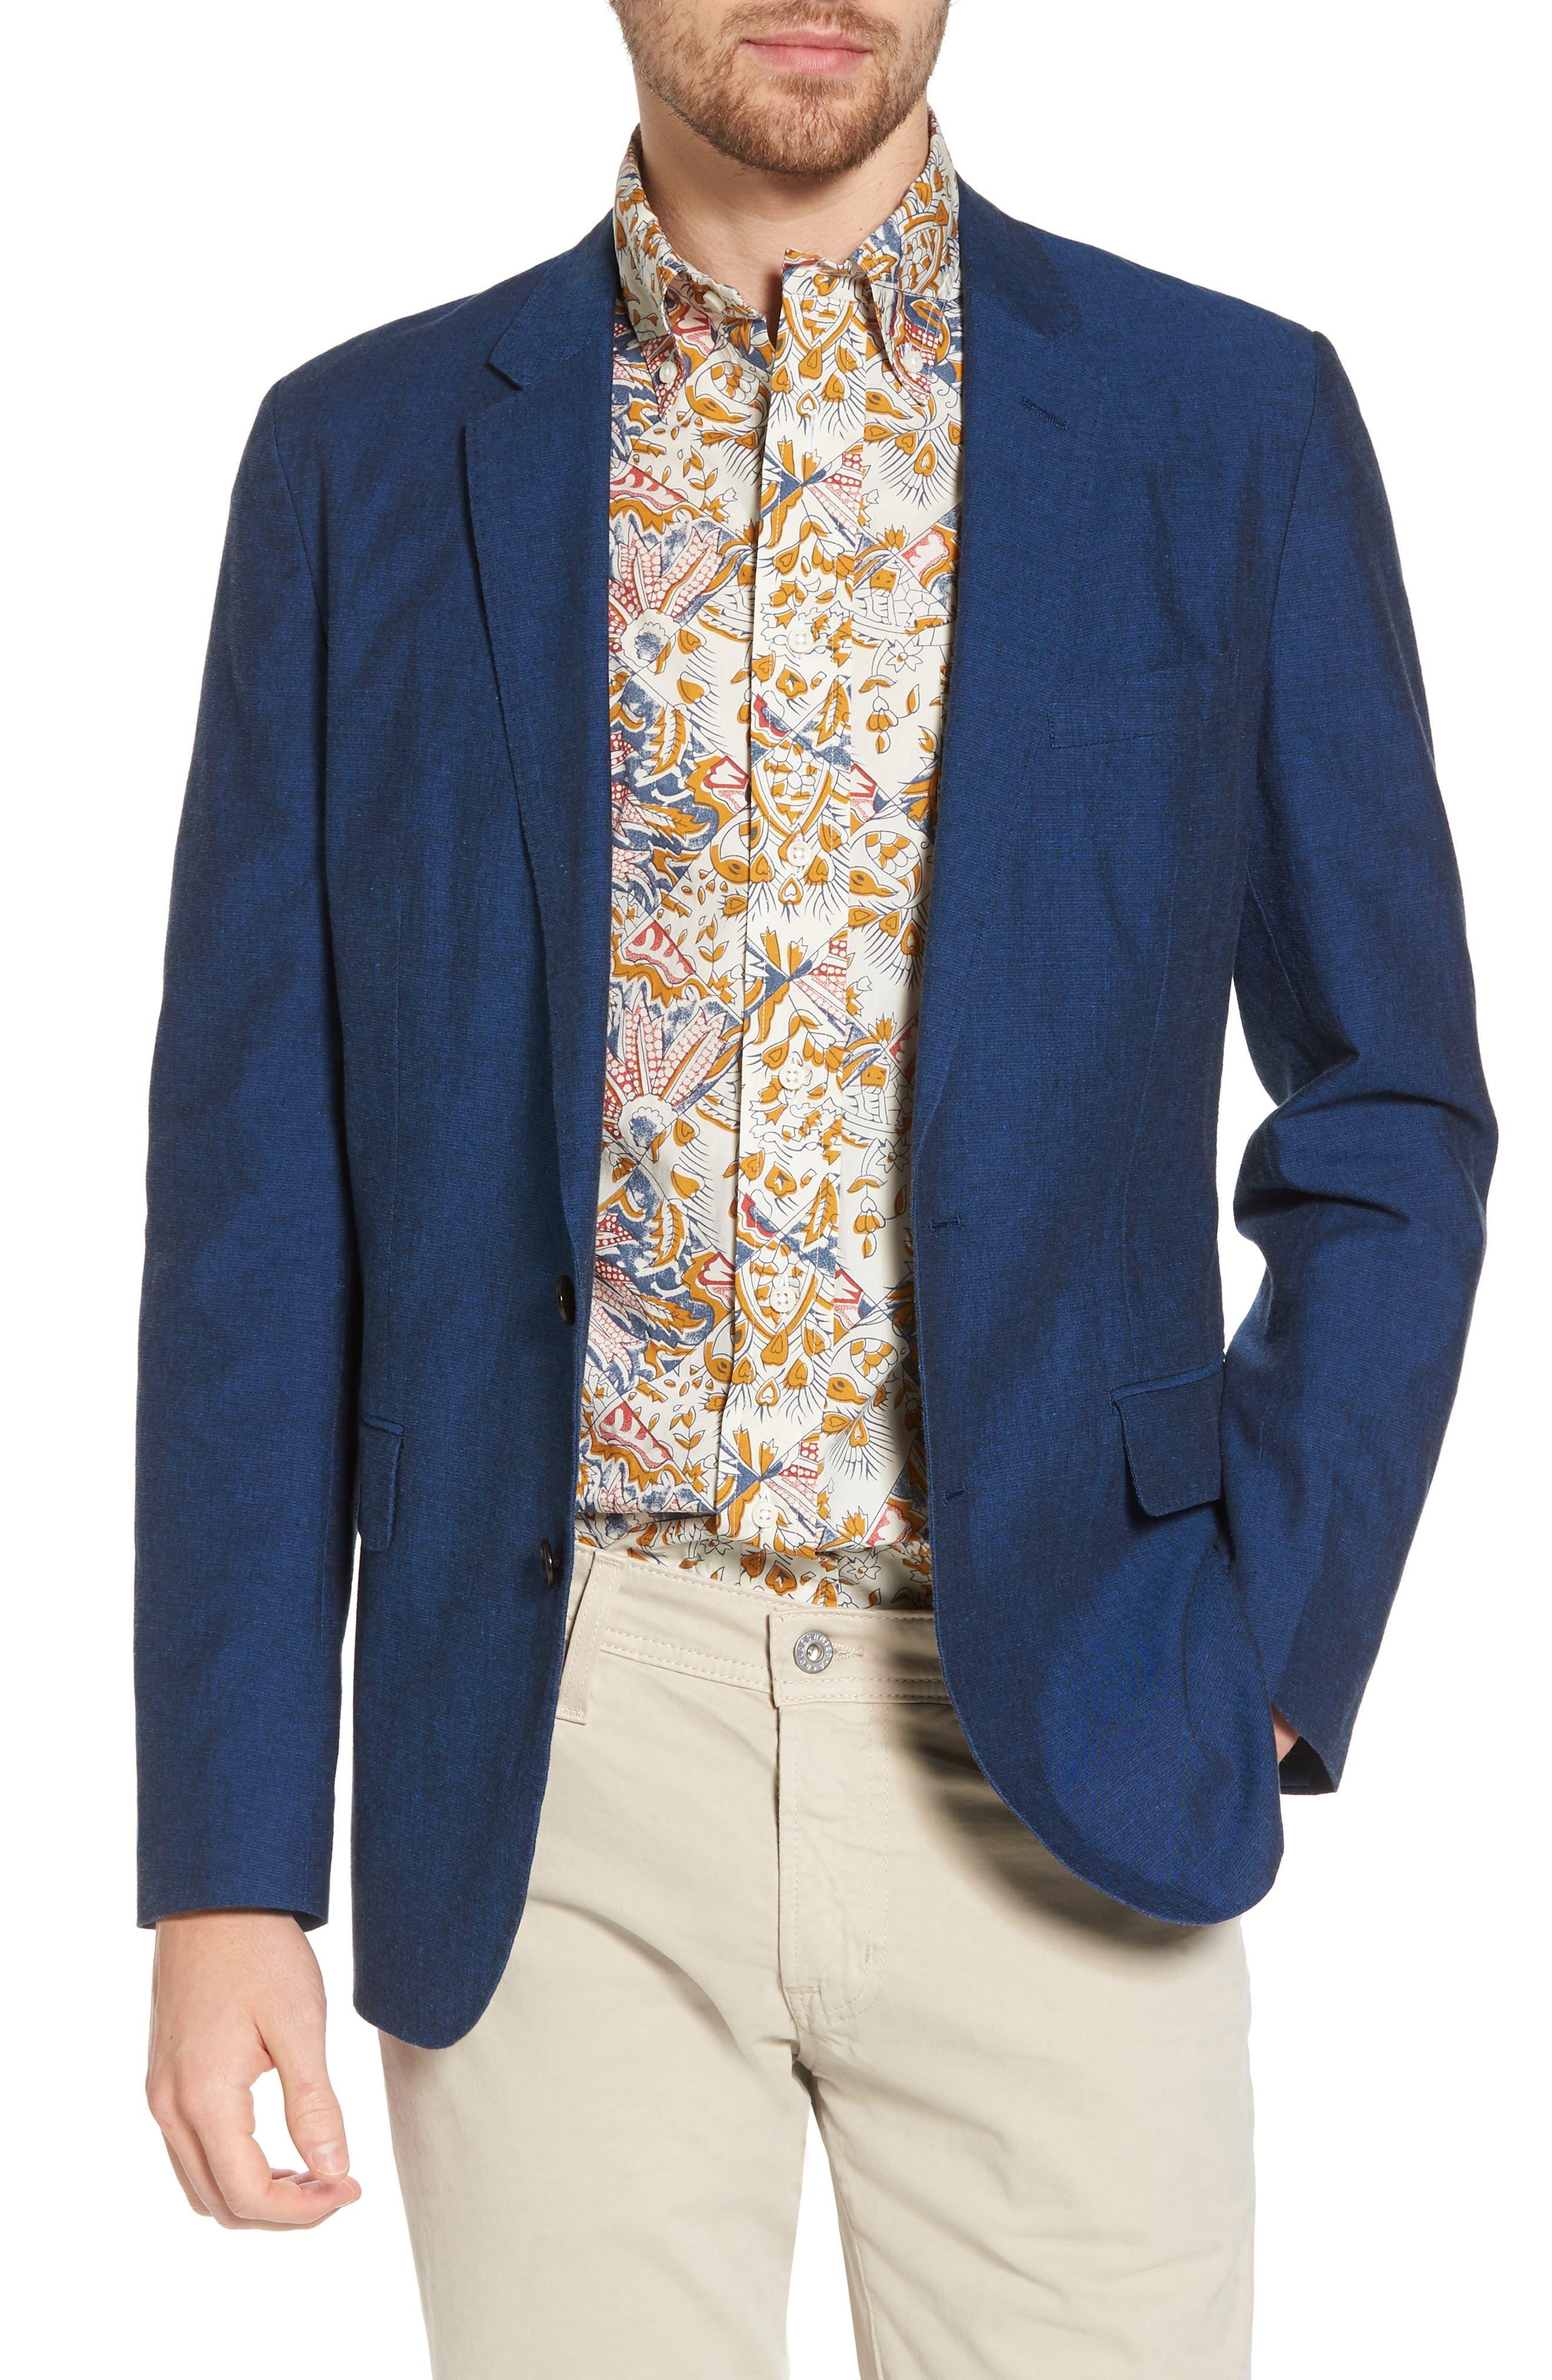 J.Crew Ludlow Cotton & Linen Blazer